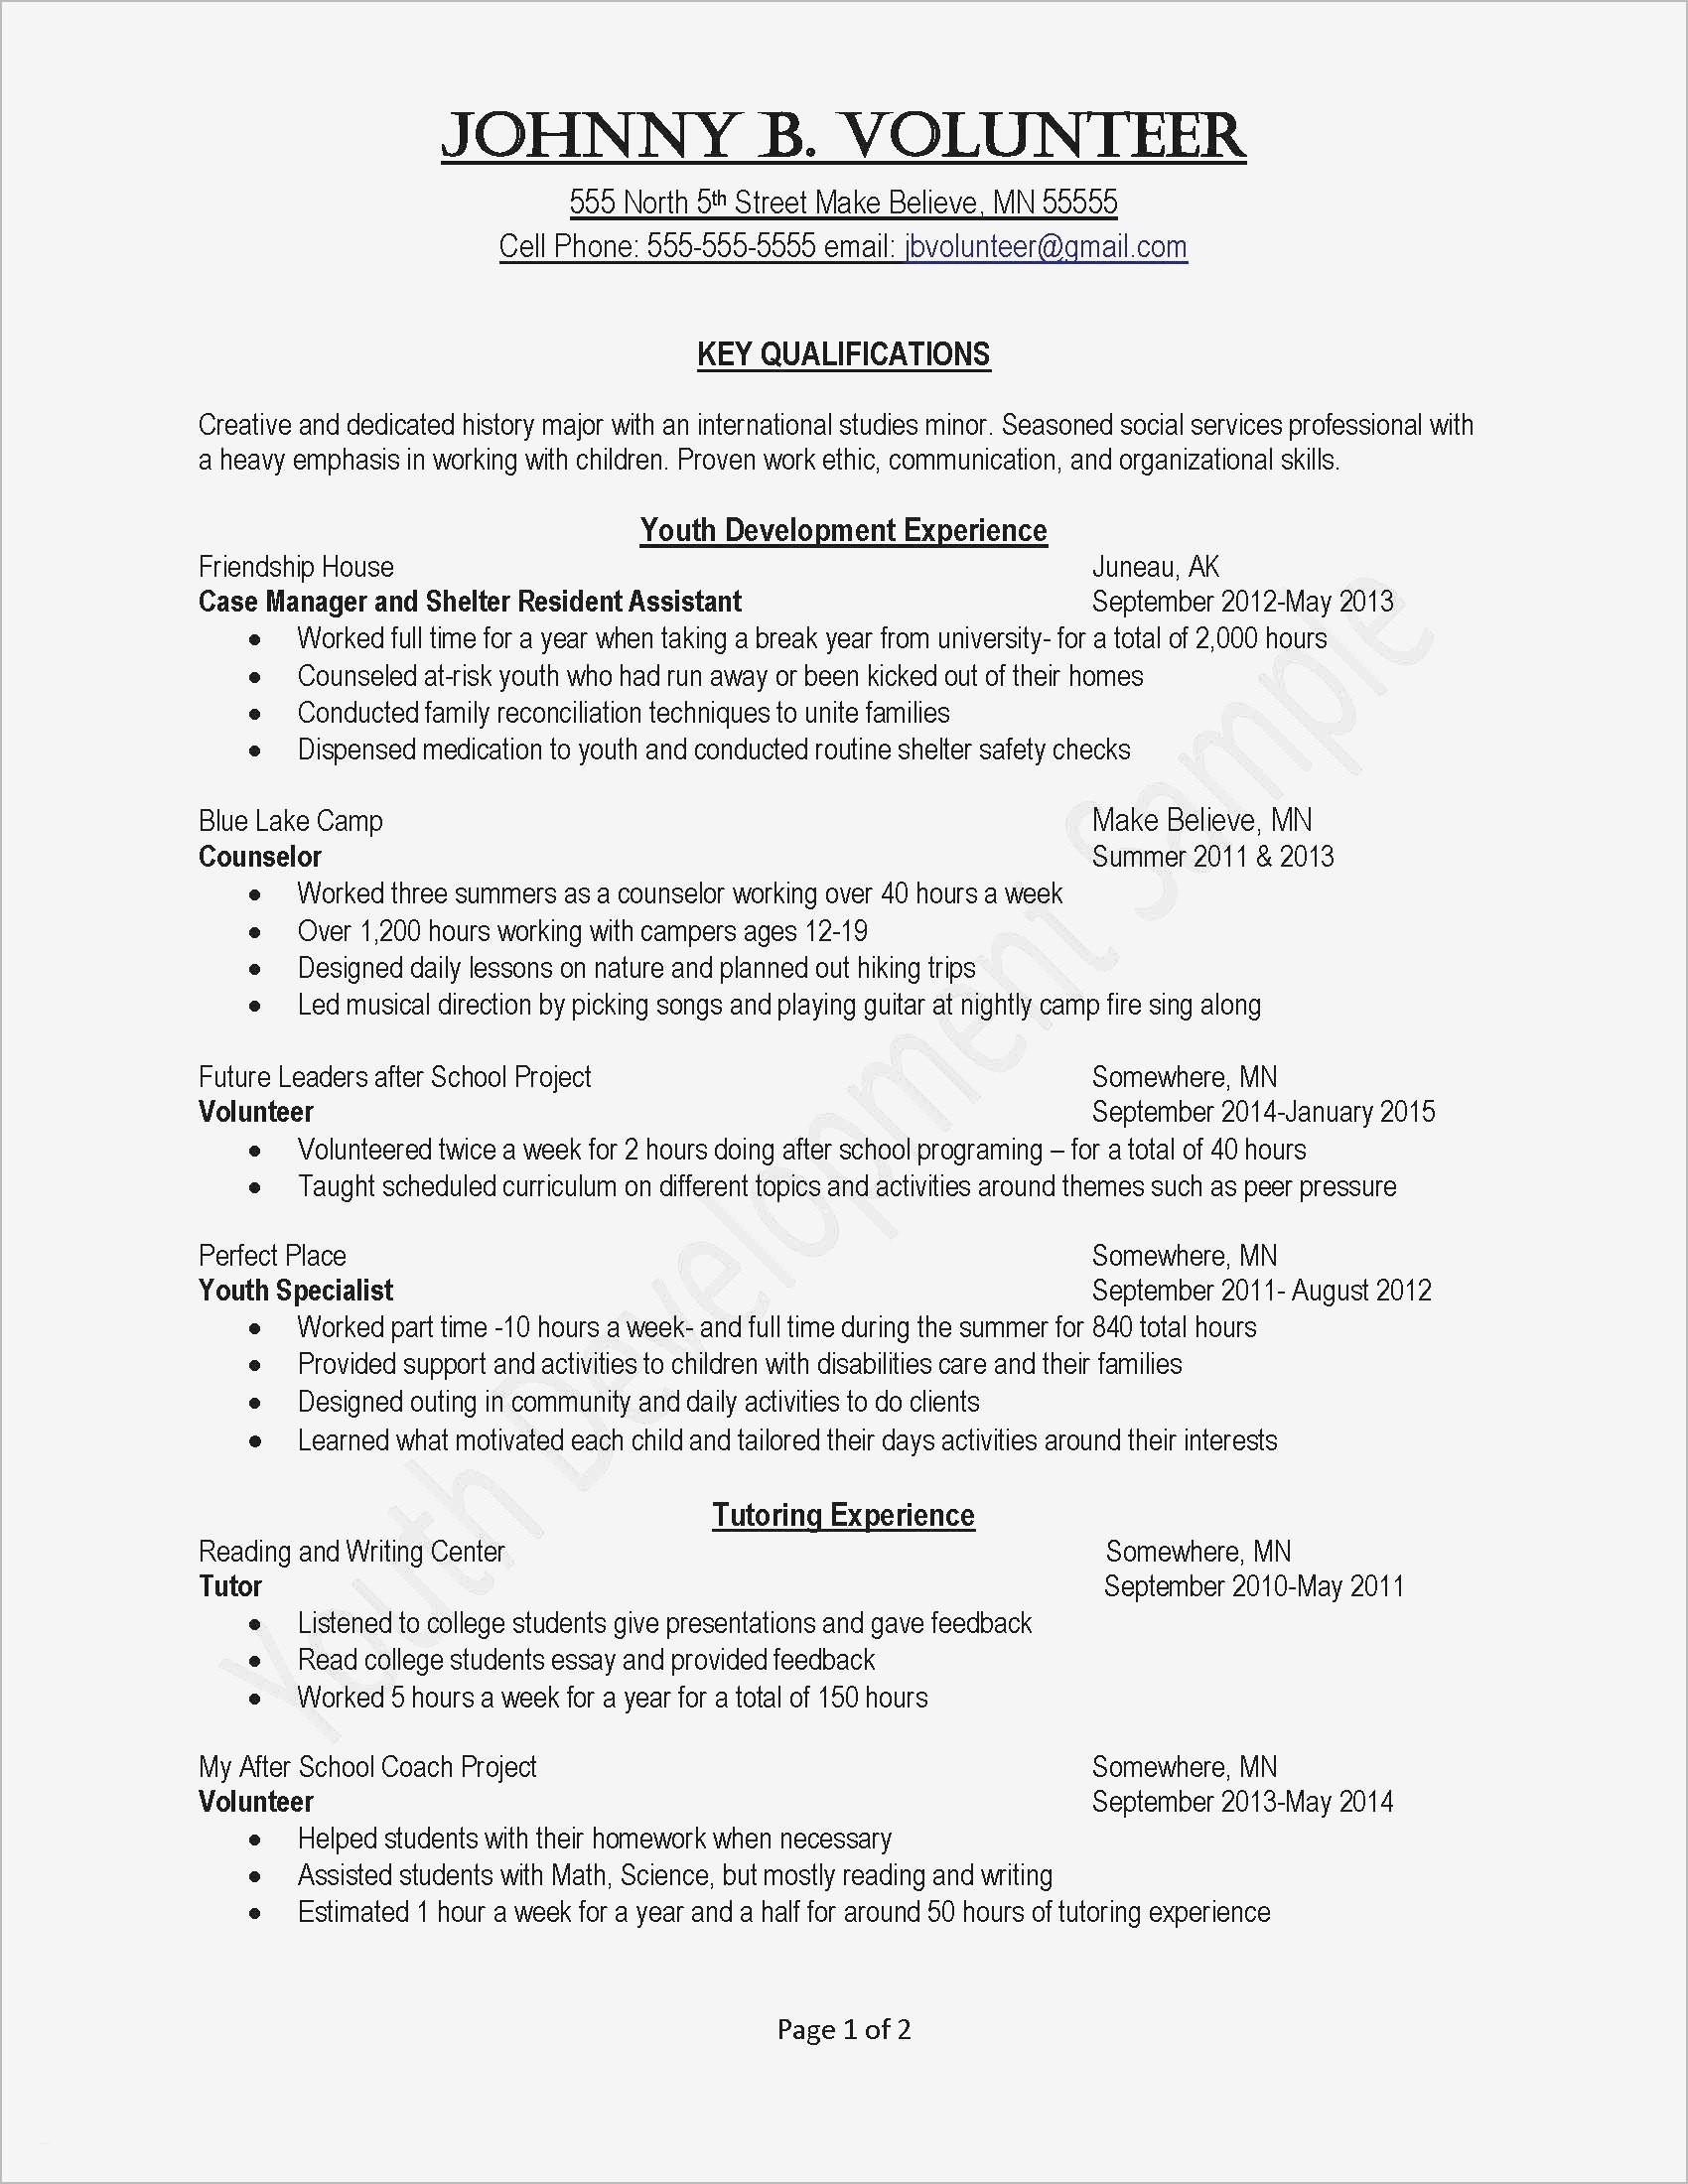 opt offer letter template lovely letter employment sample template